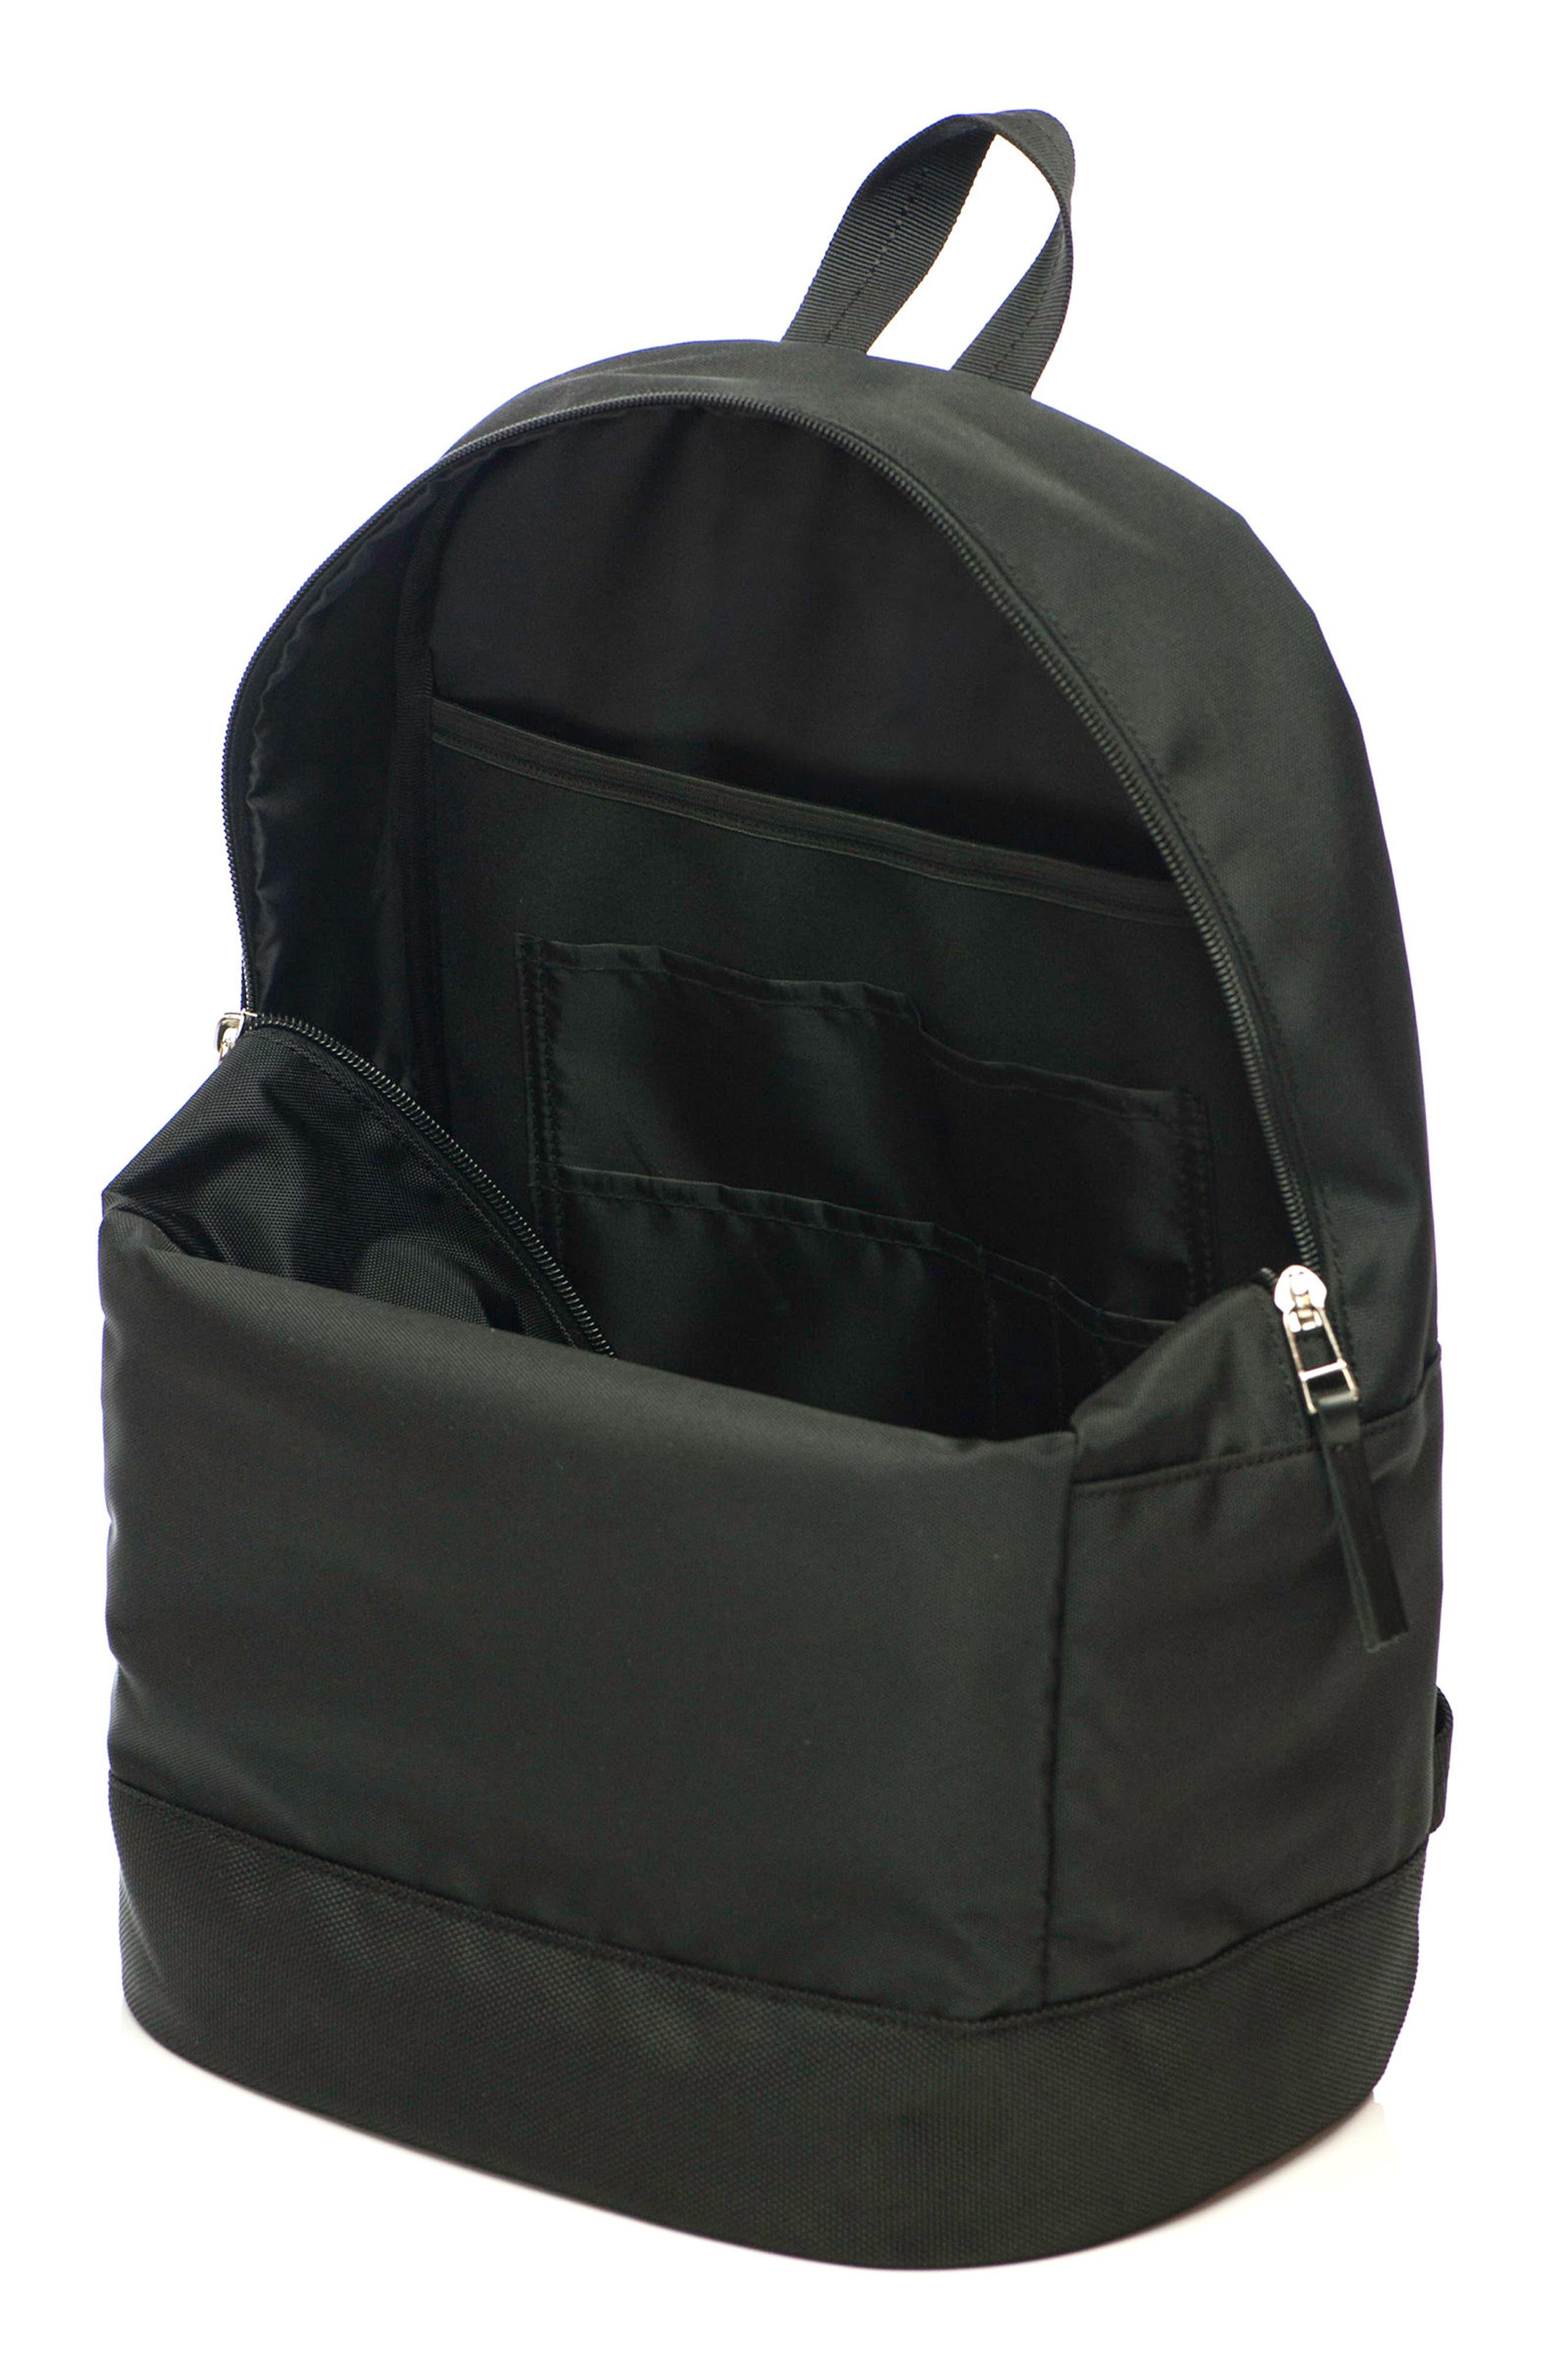 Tomcat Backpack,                             Alternate thumbnail 3, color,                             Black